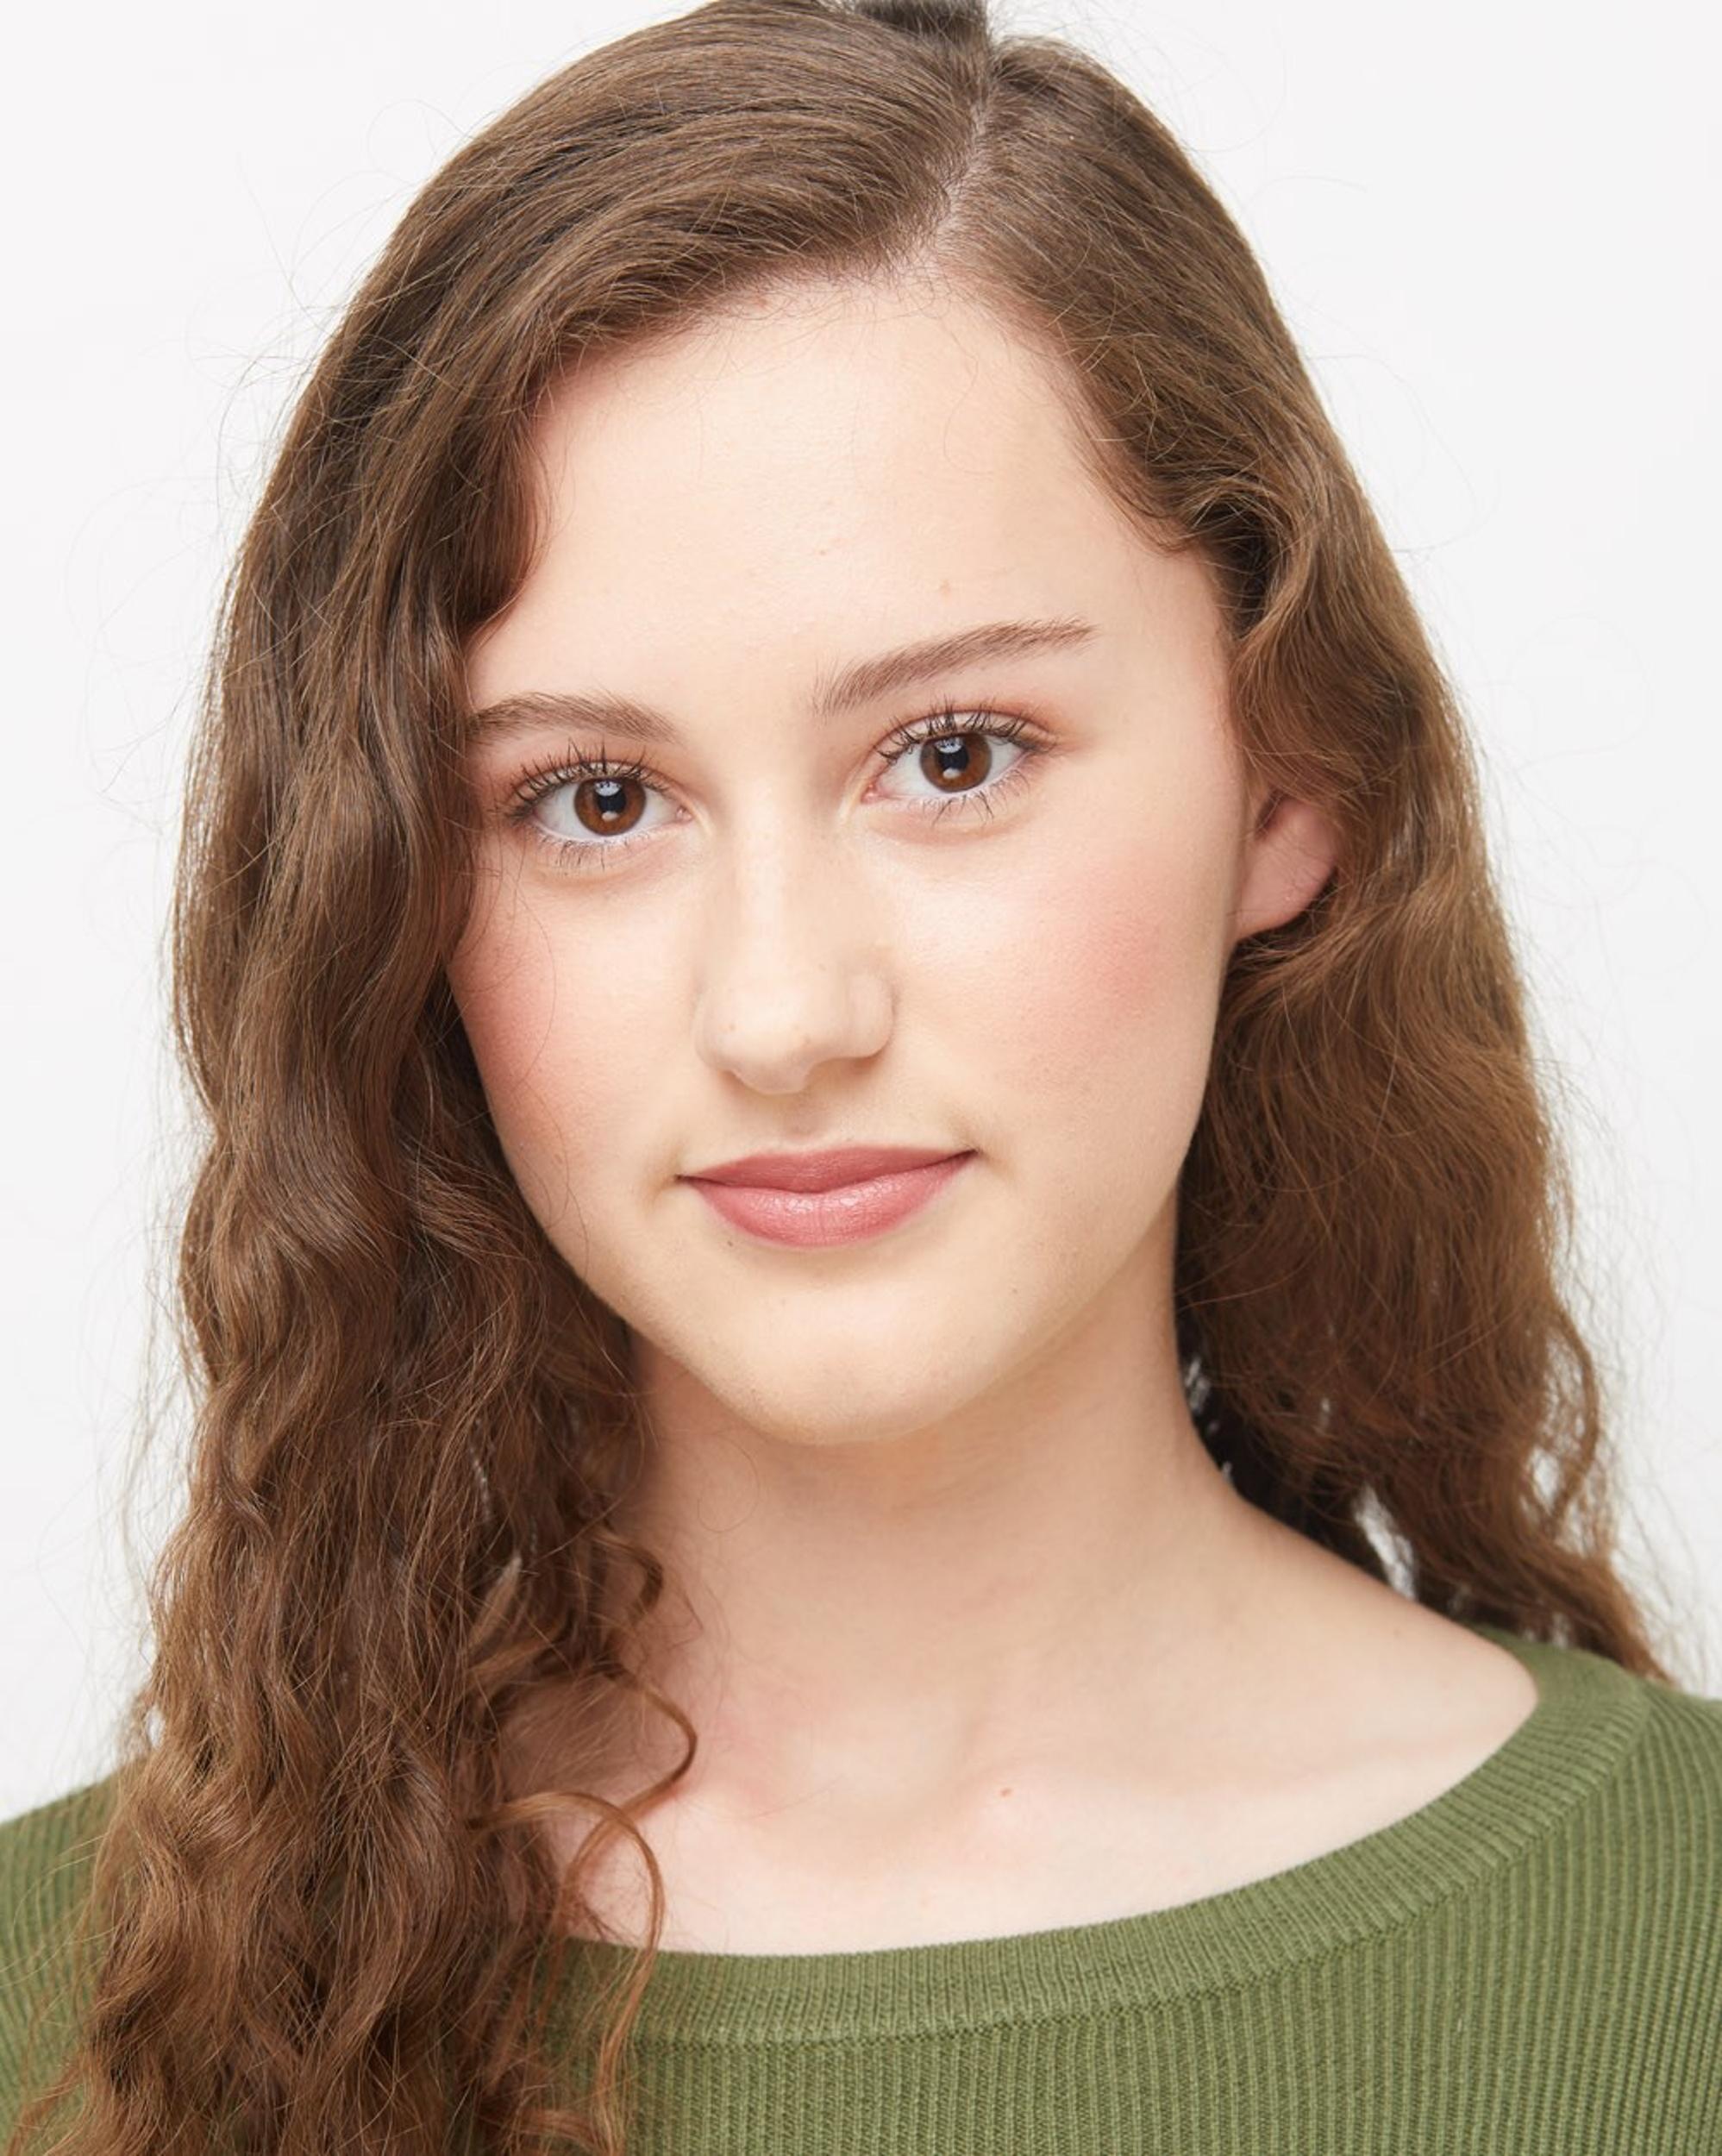 Isabella Woodlock